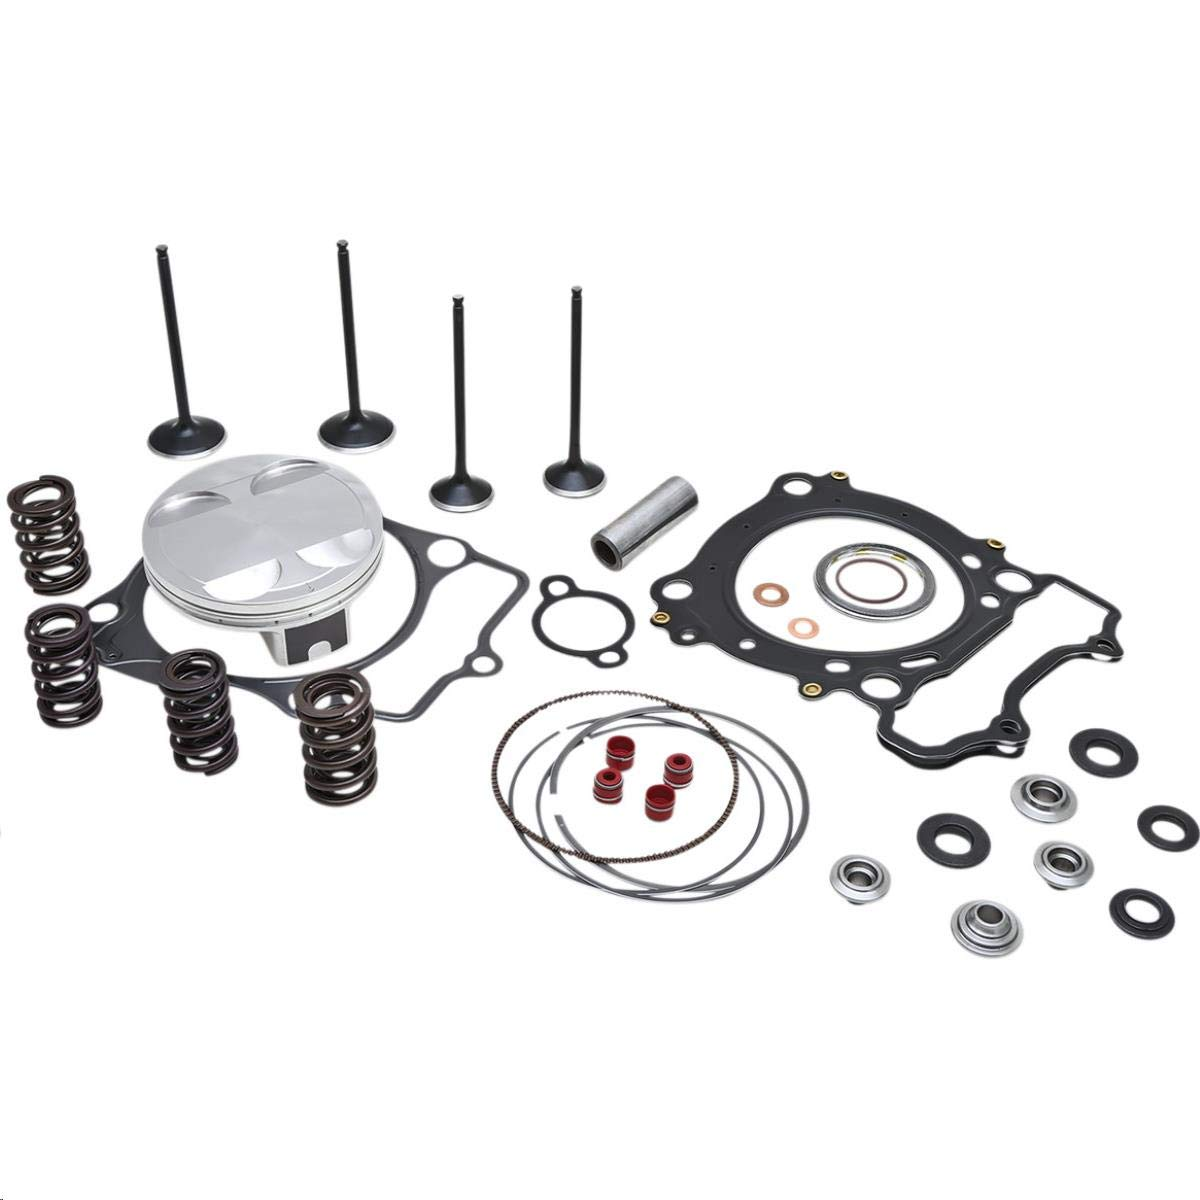 Kibblewhite Precision Crf450x 05-17 Full Top End Kit Crf450x 30-32900 New